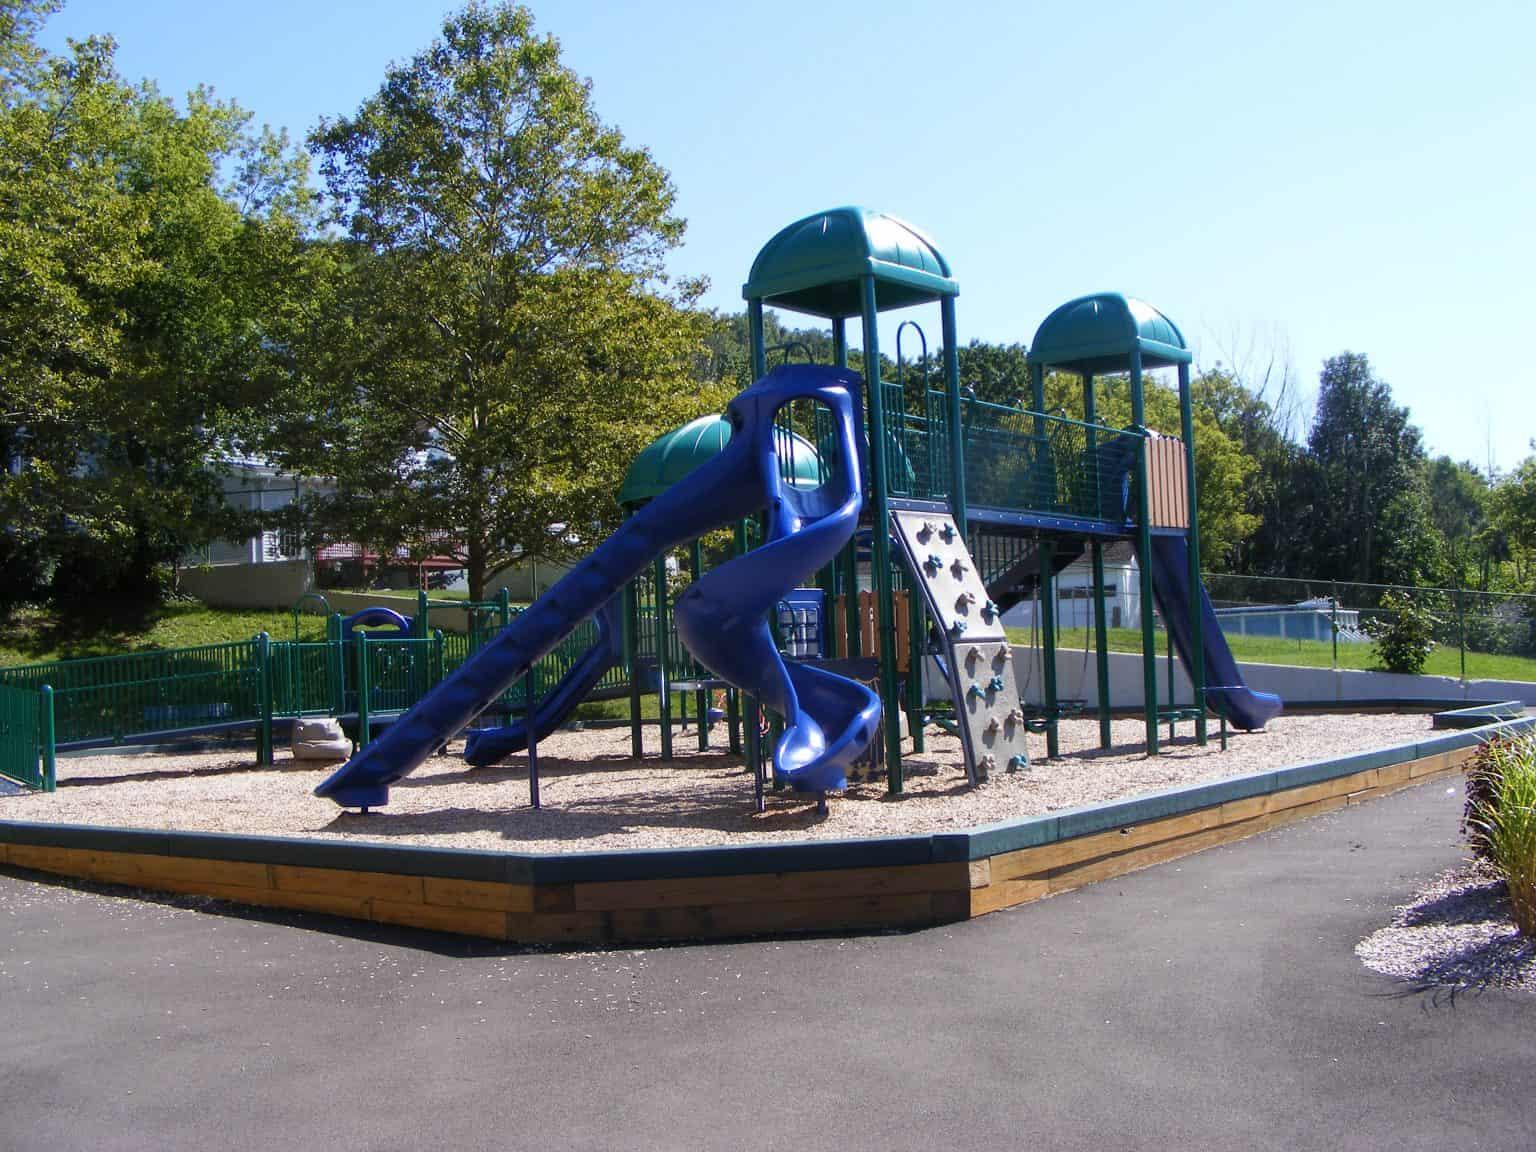 woodrow-wilson-elementary-playground-binghamton-ny_11712082283_o-1536x1152